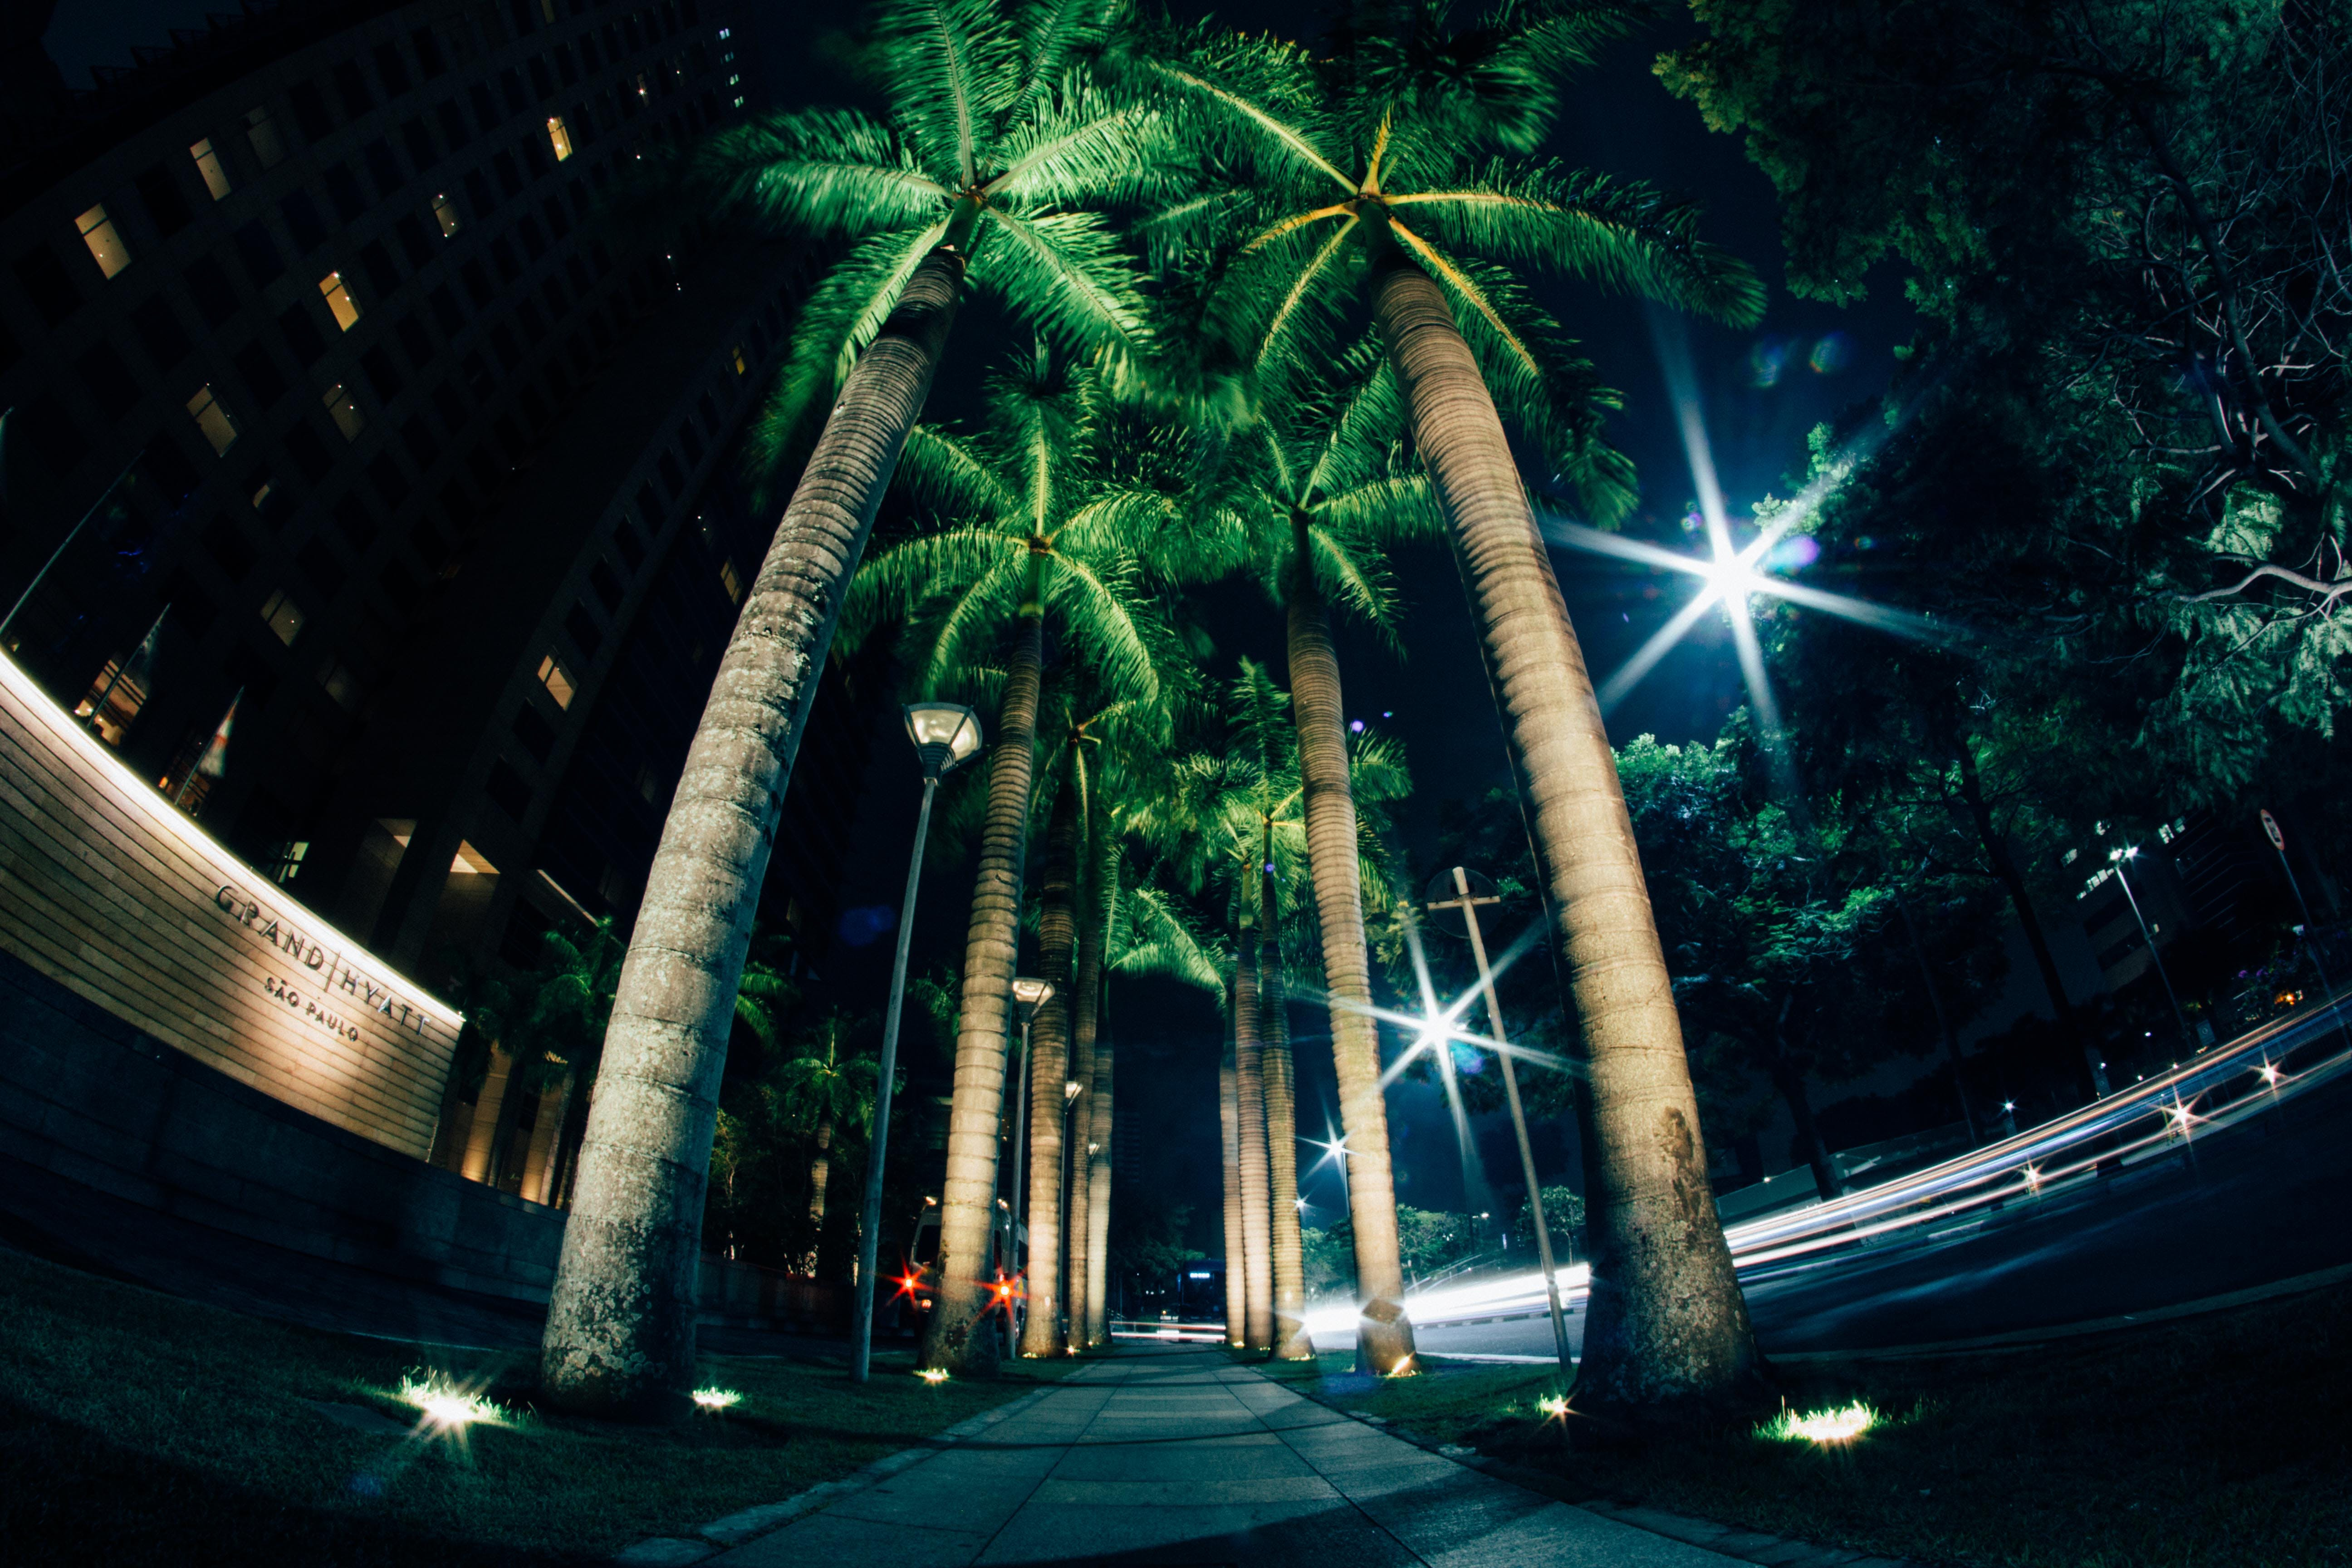 Free stock photo of lights, night, street, sidewalk